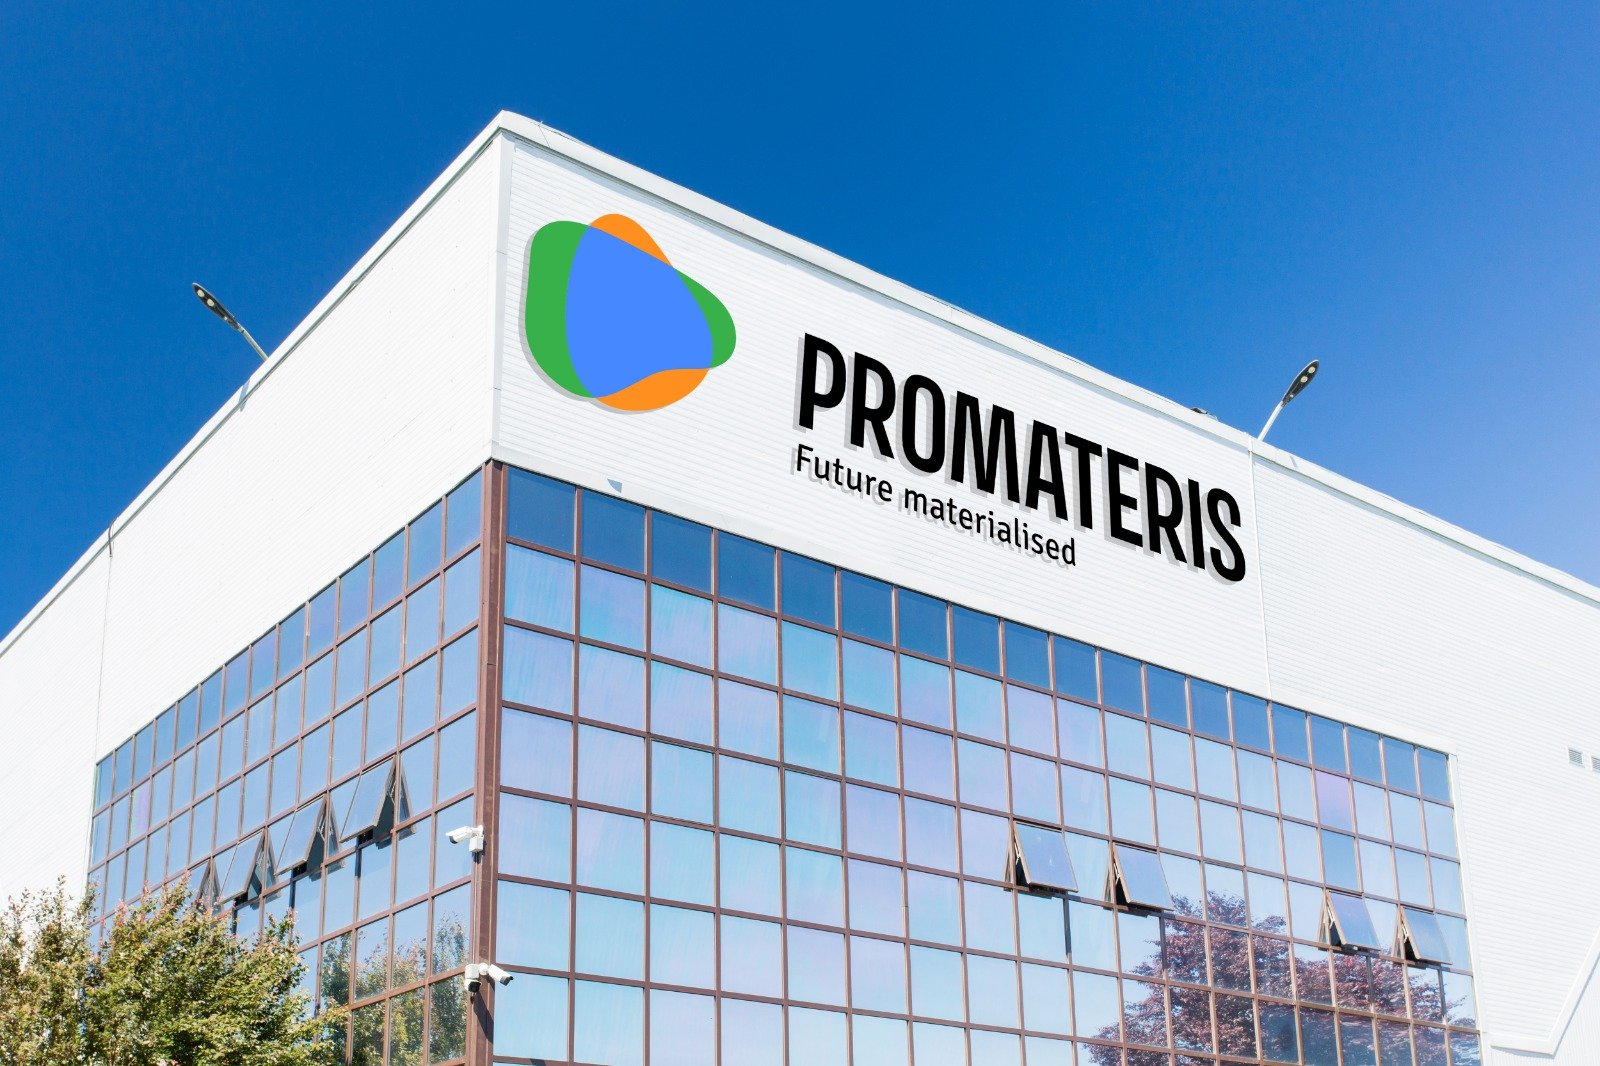 Innovation Insight – Promateris Packaging